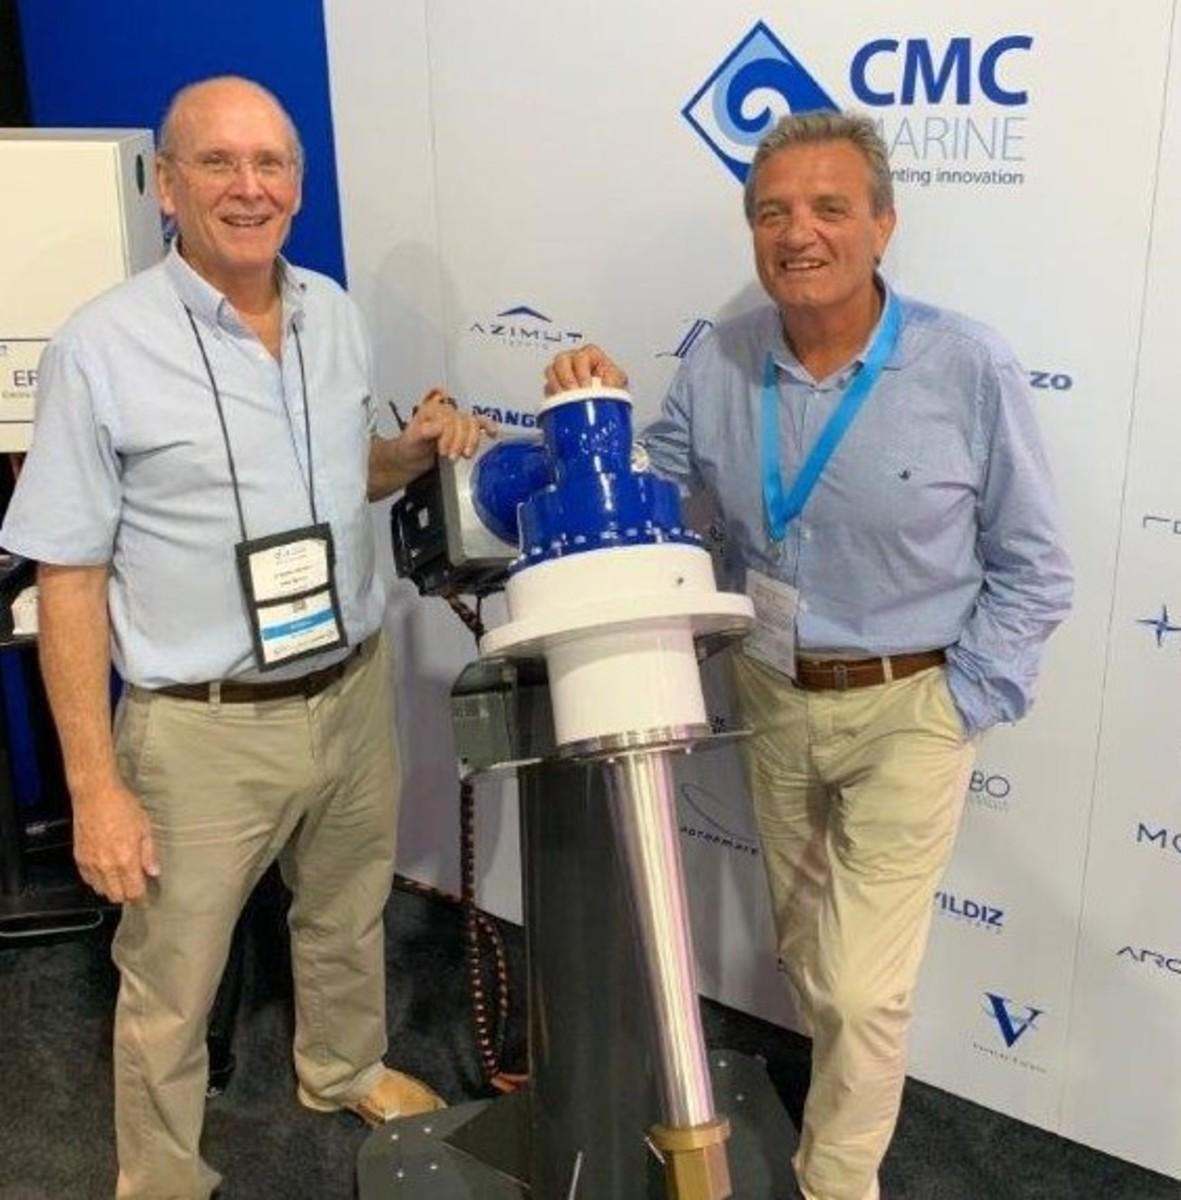 Buddy Morgan (left) new US Sales Director, with CMC CEO Alessandro Cappiello.